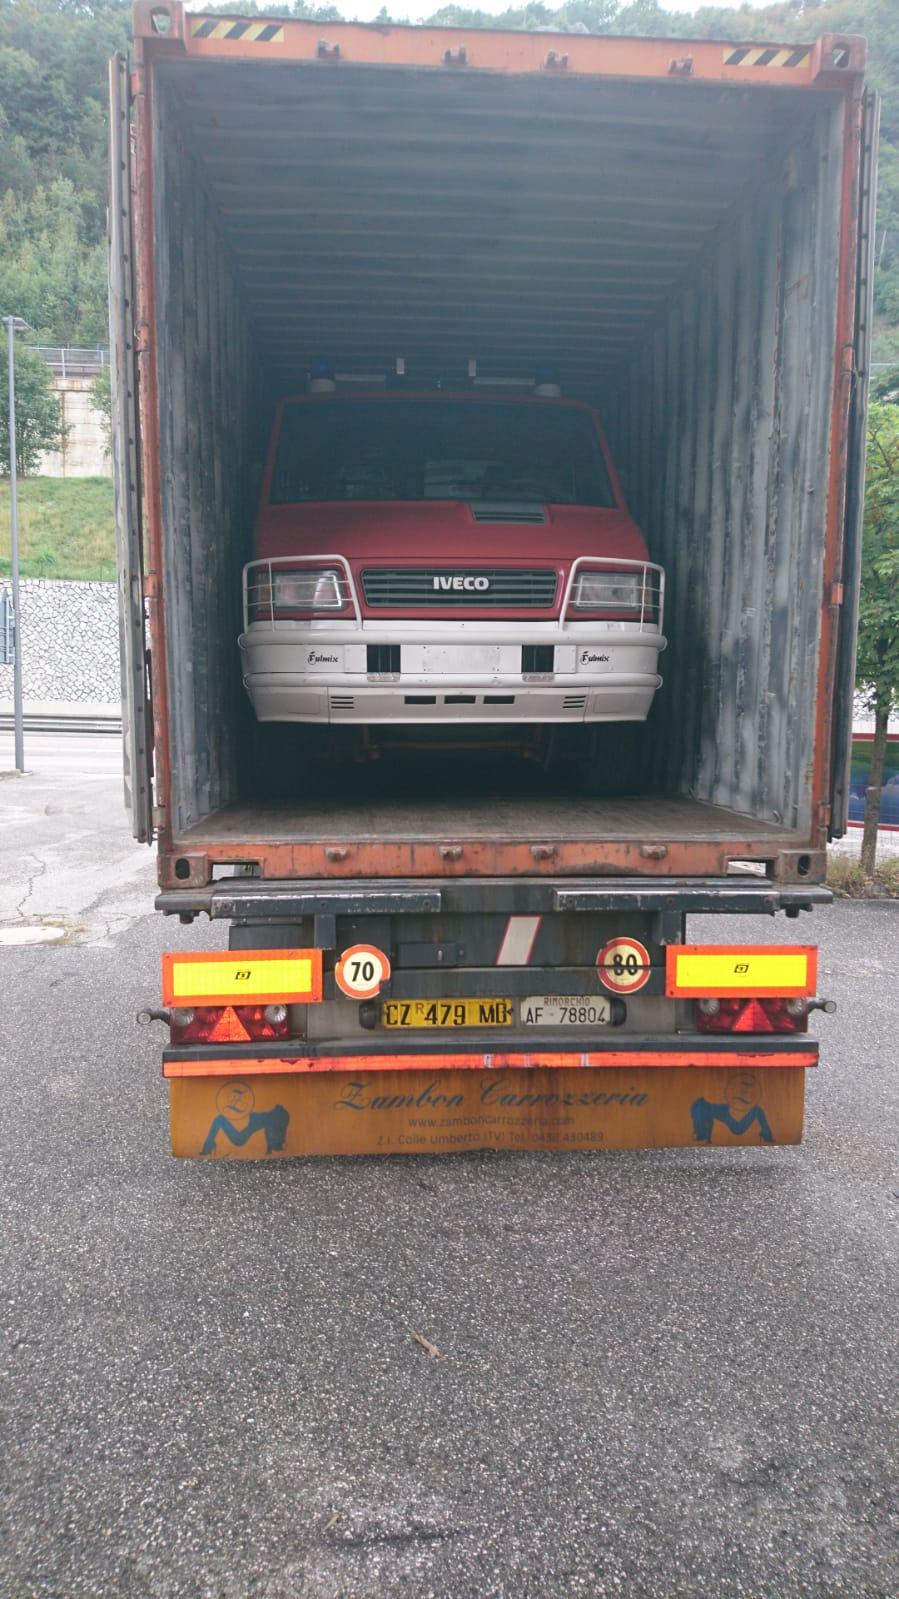 container-22-9-2020-IMG-20200922-WA0000